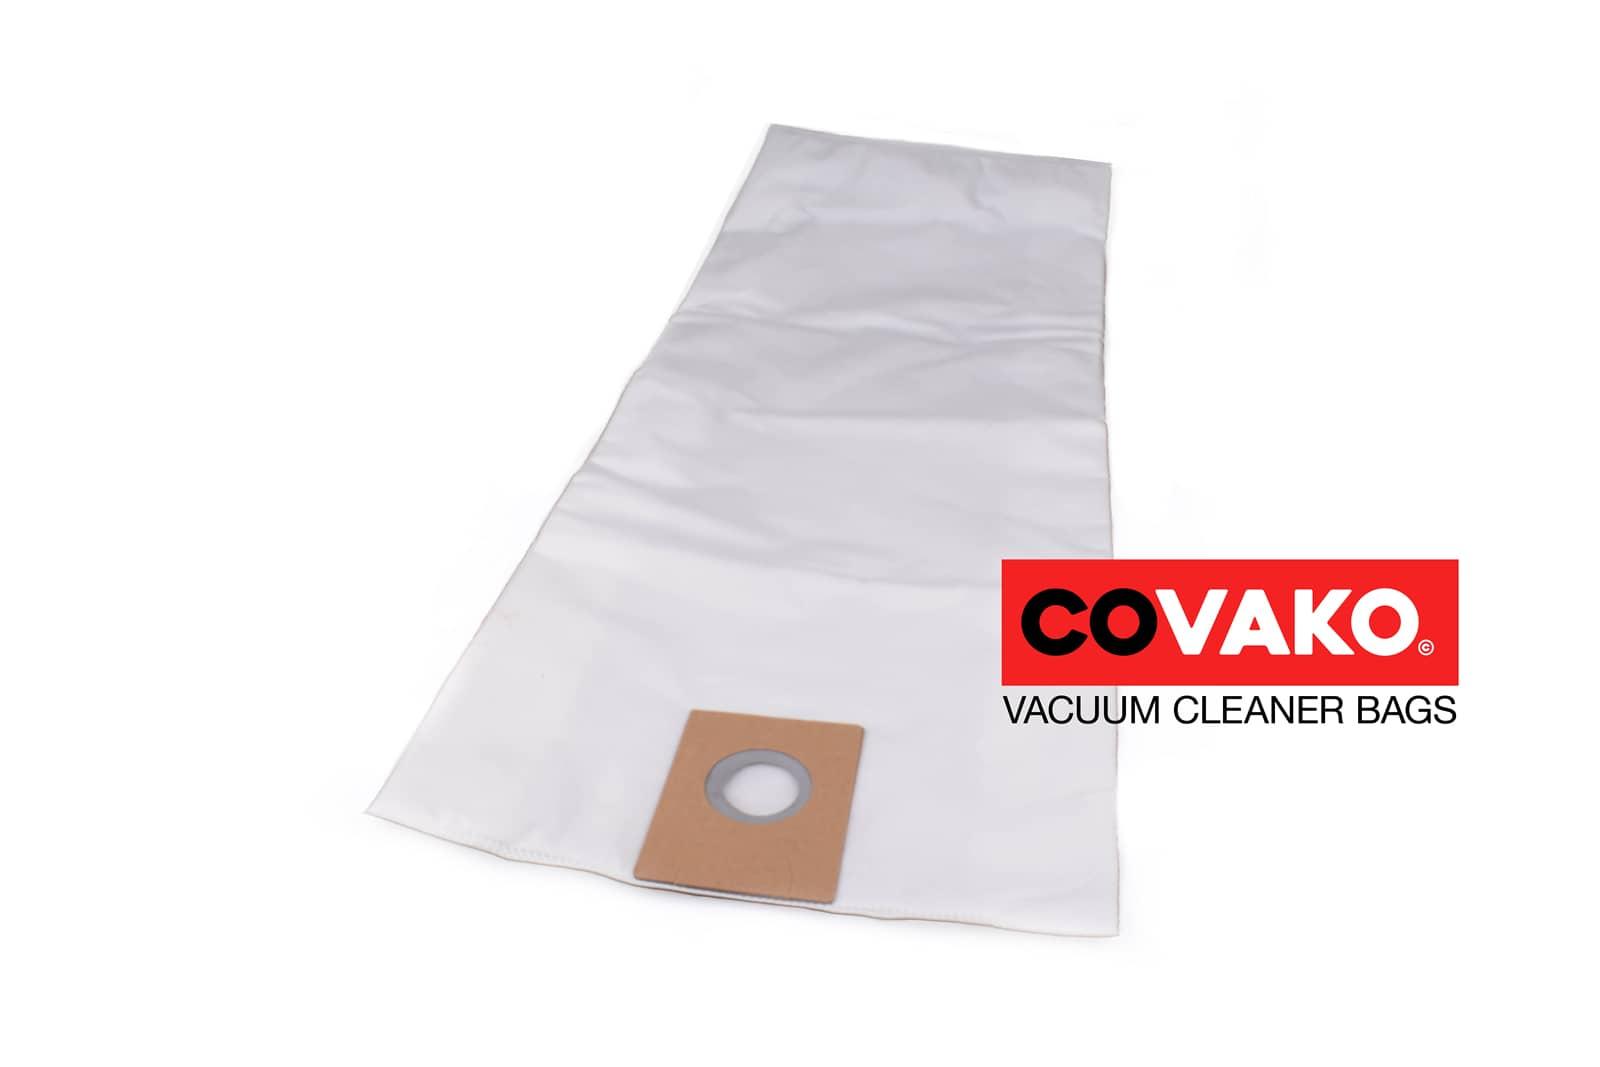 Fimap FV 80 / Synthétique - Fimap sacs d'aspirateur